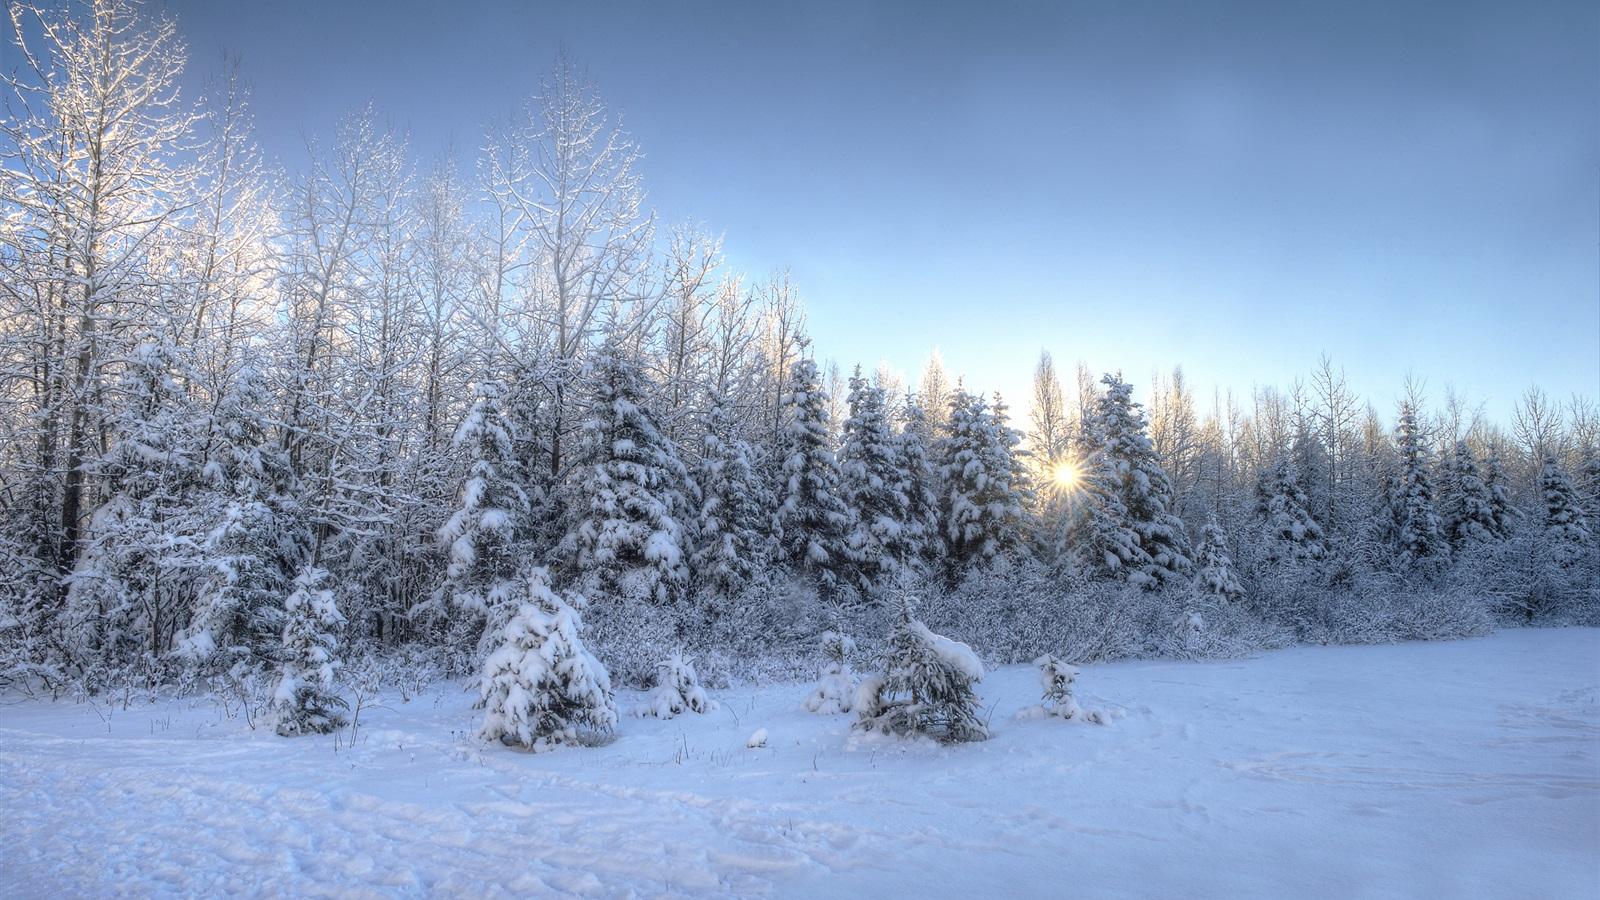 1600x900 hd desktop wallpaper winter - photo #49